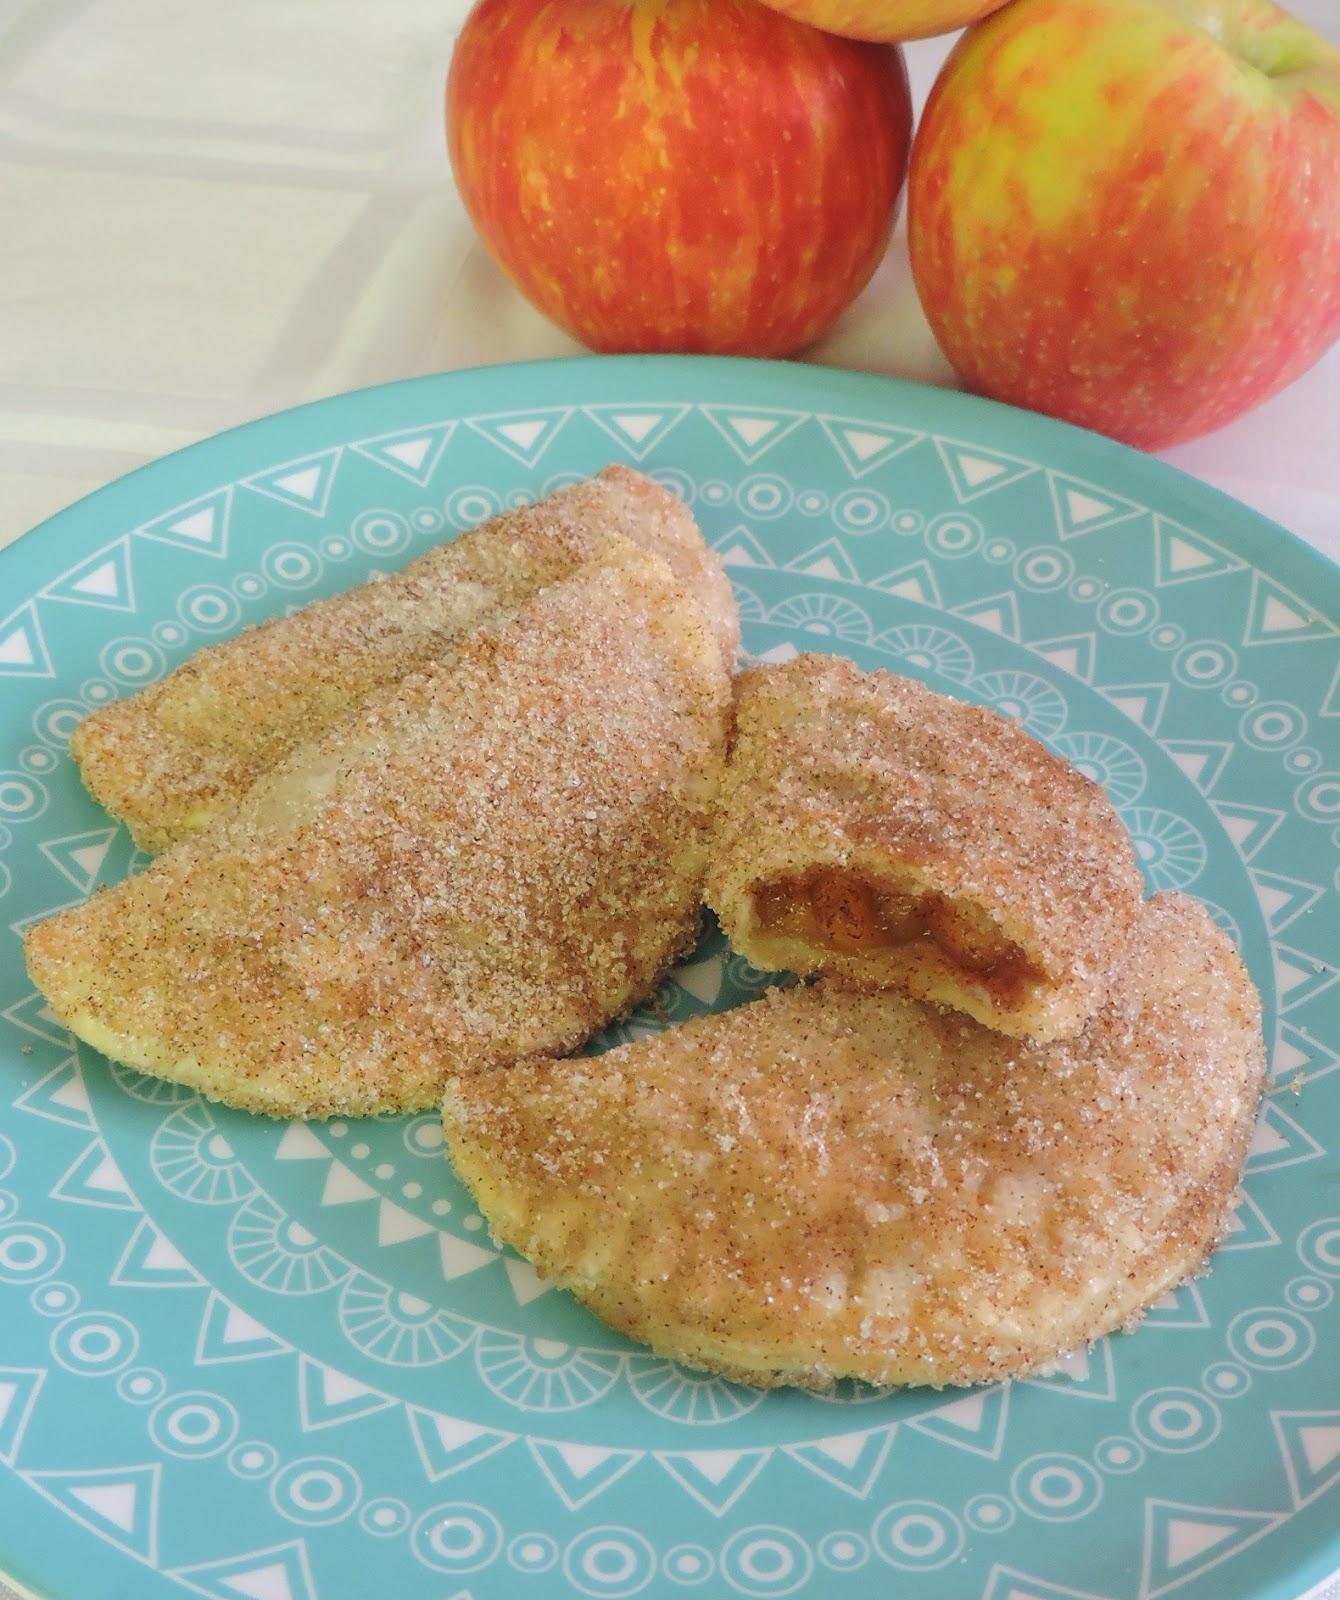 Carmelized Apple Pies